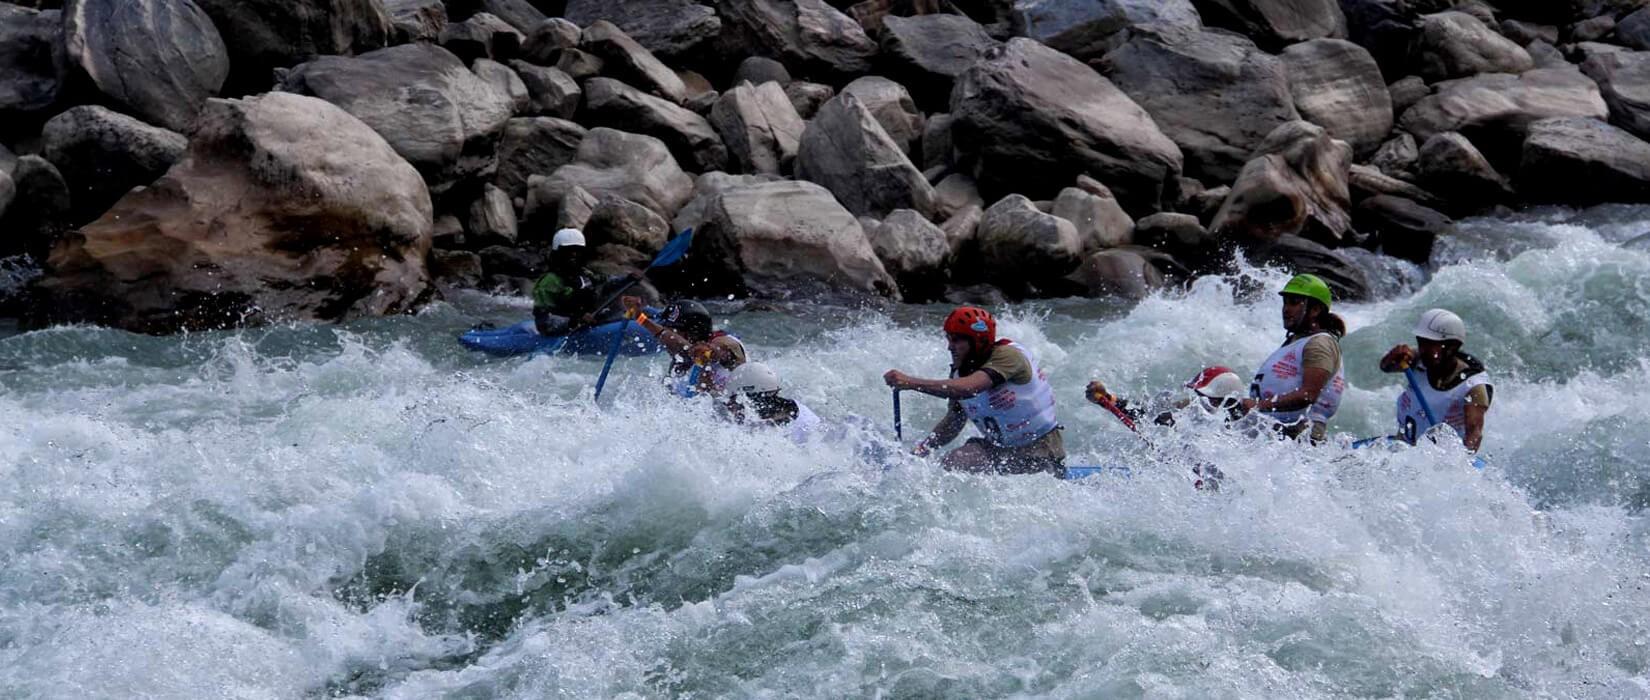 Thrilling Adventure Experience